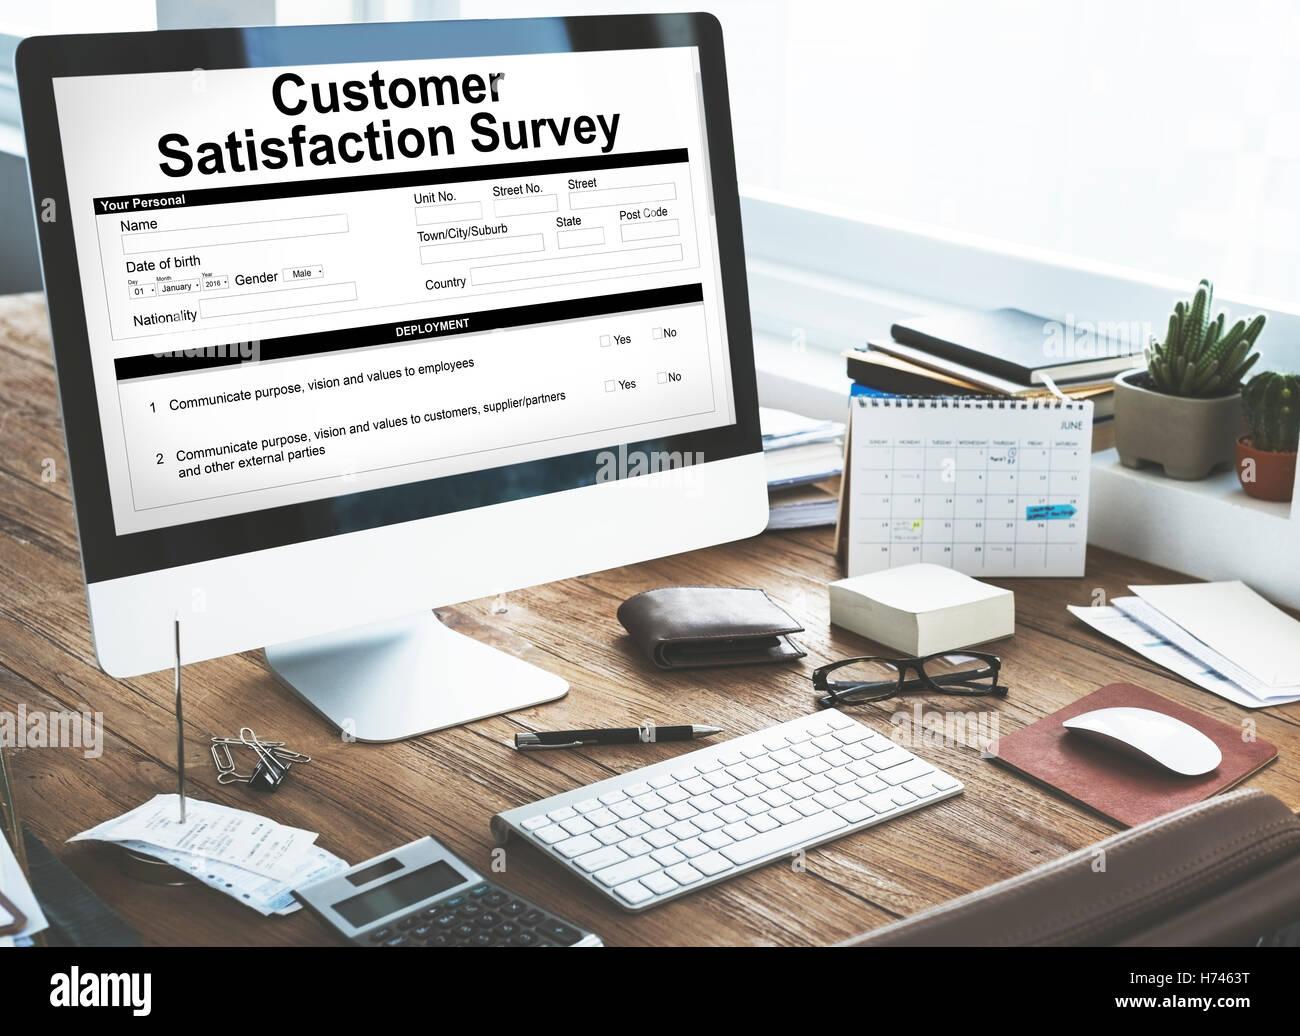 Customer Satisfaction Survey Client Service Concept - Stock Image